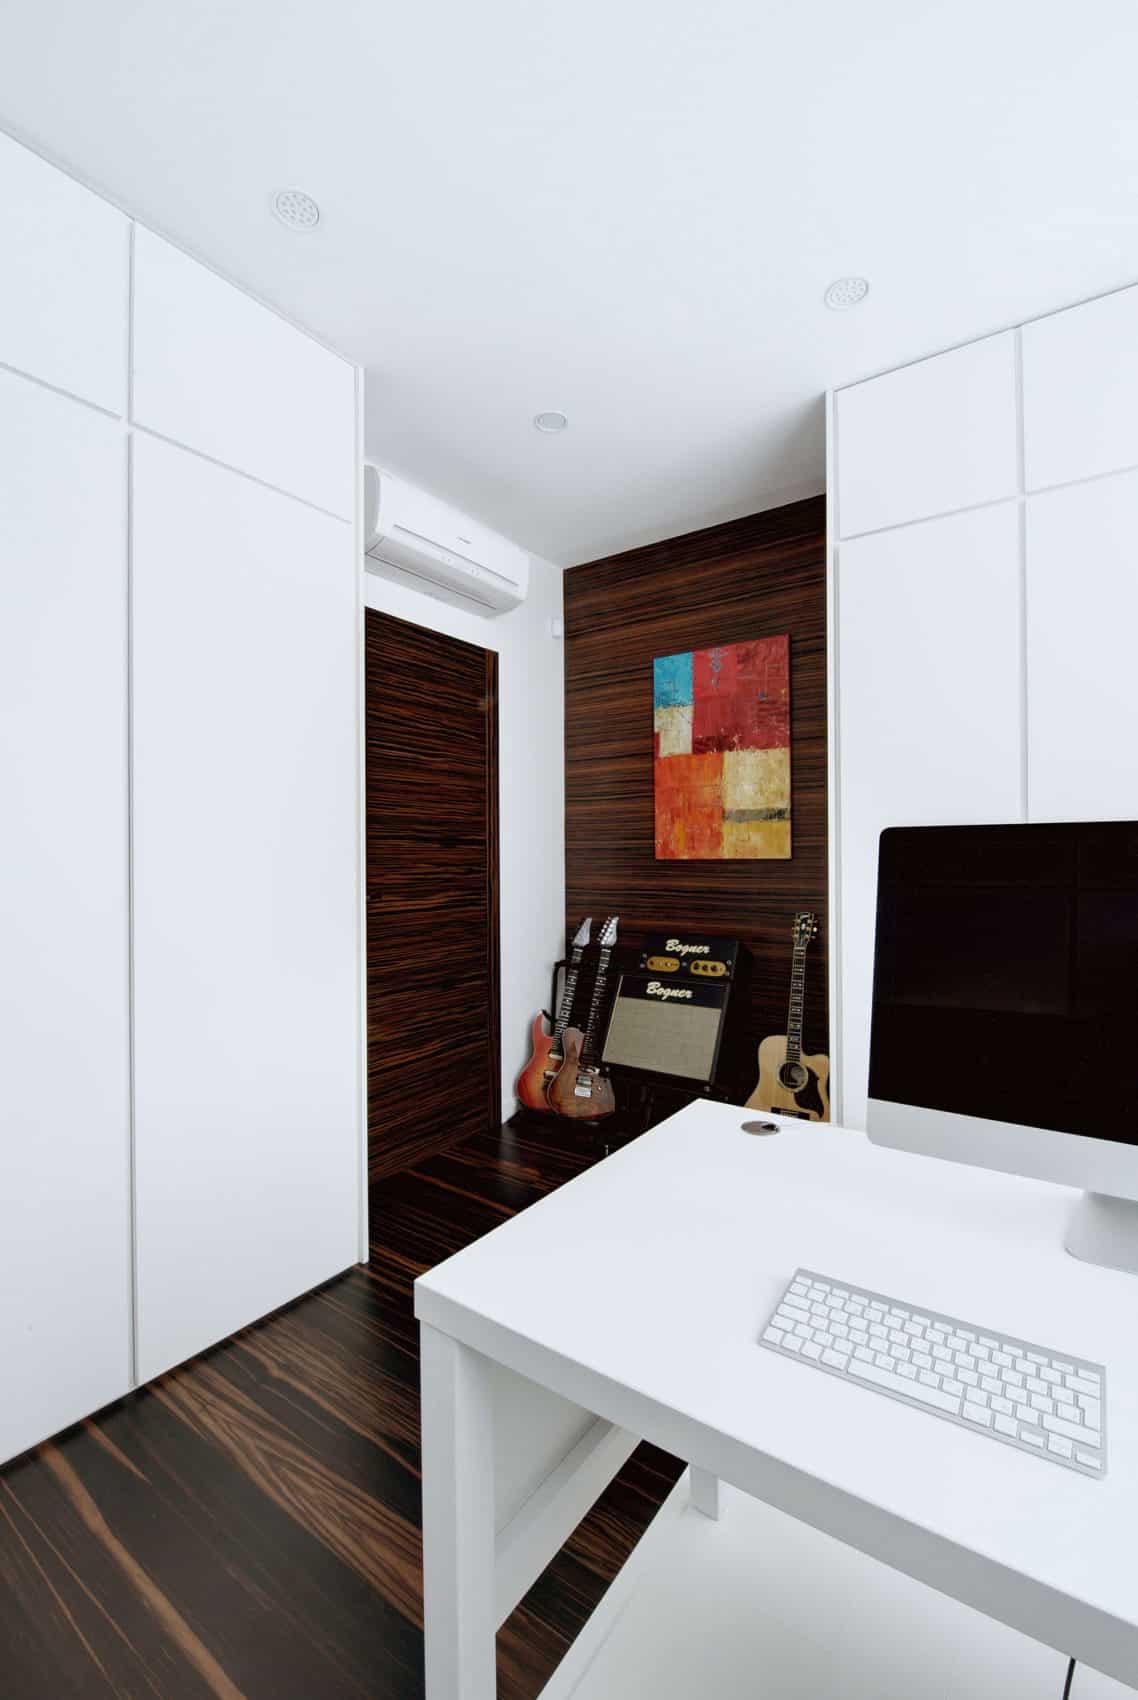 Apartment Renovation in Moscow by Vladimir Malashonok (12)